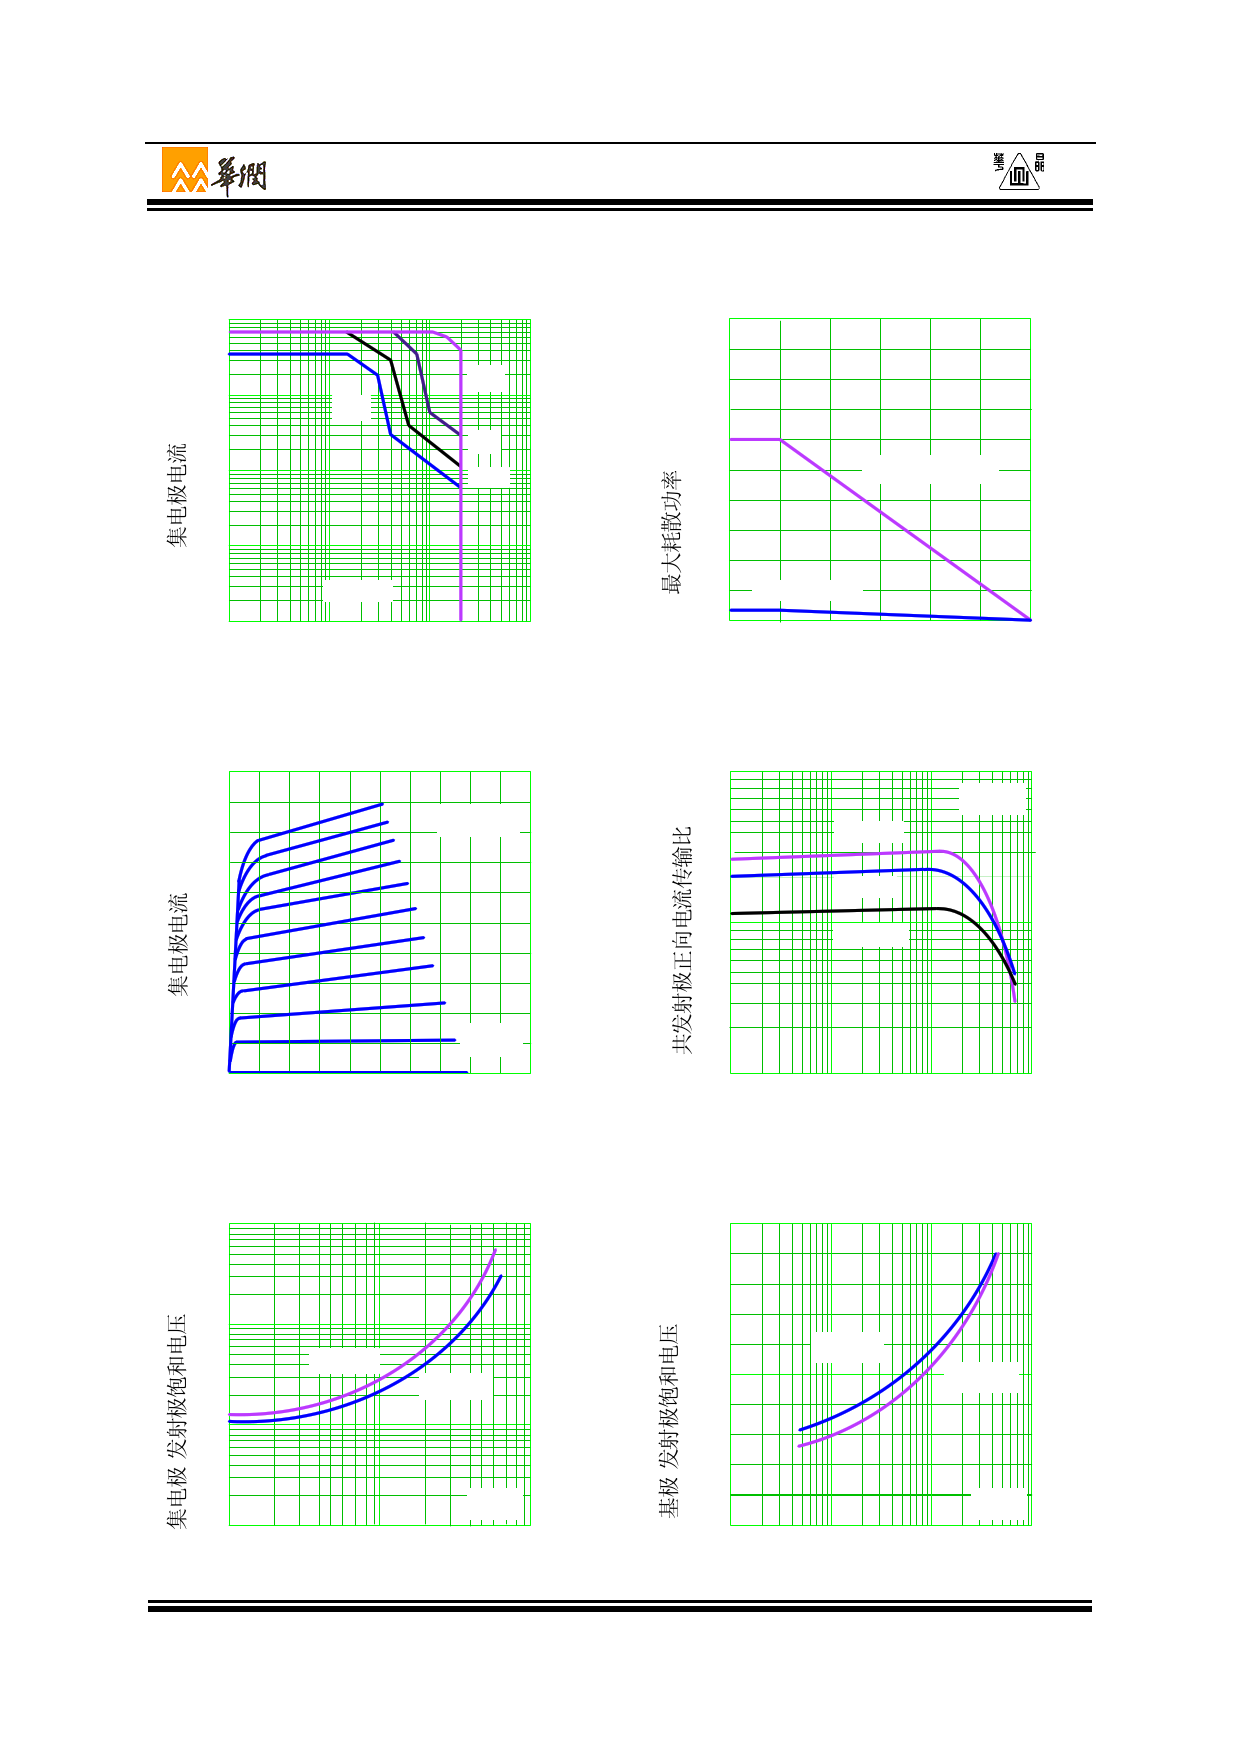 3DD128FH8D pdf, ピン配列